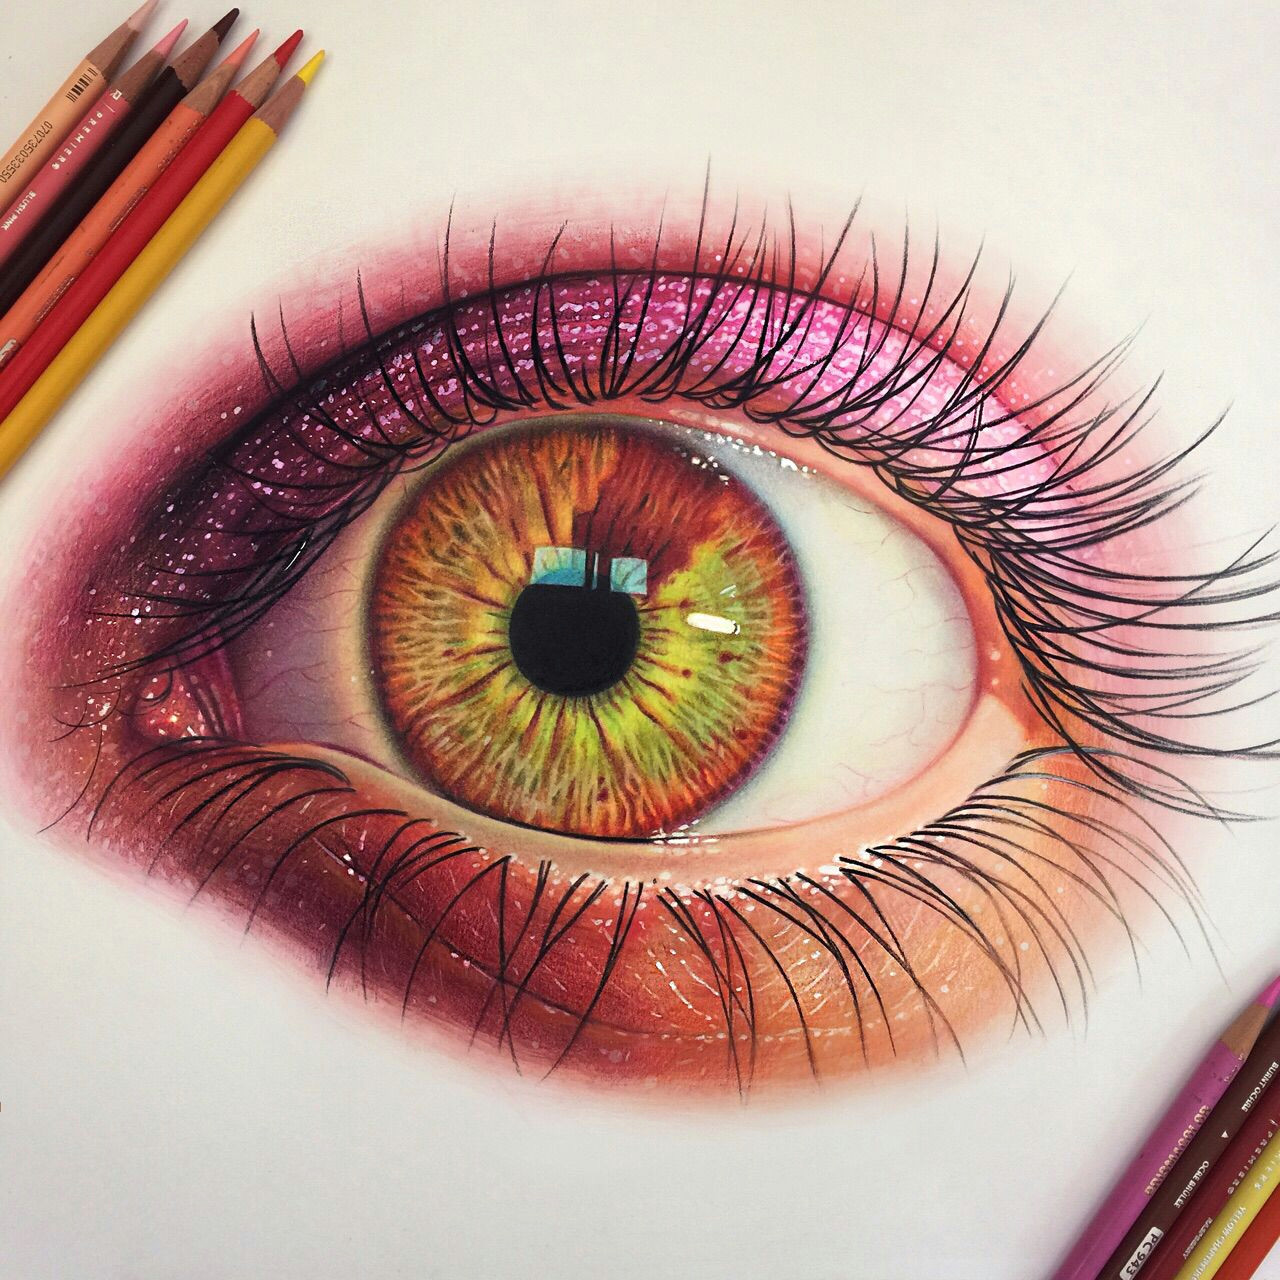 painting drawing watercolor painting realistic pencil drawings eye drawings